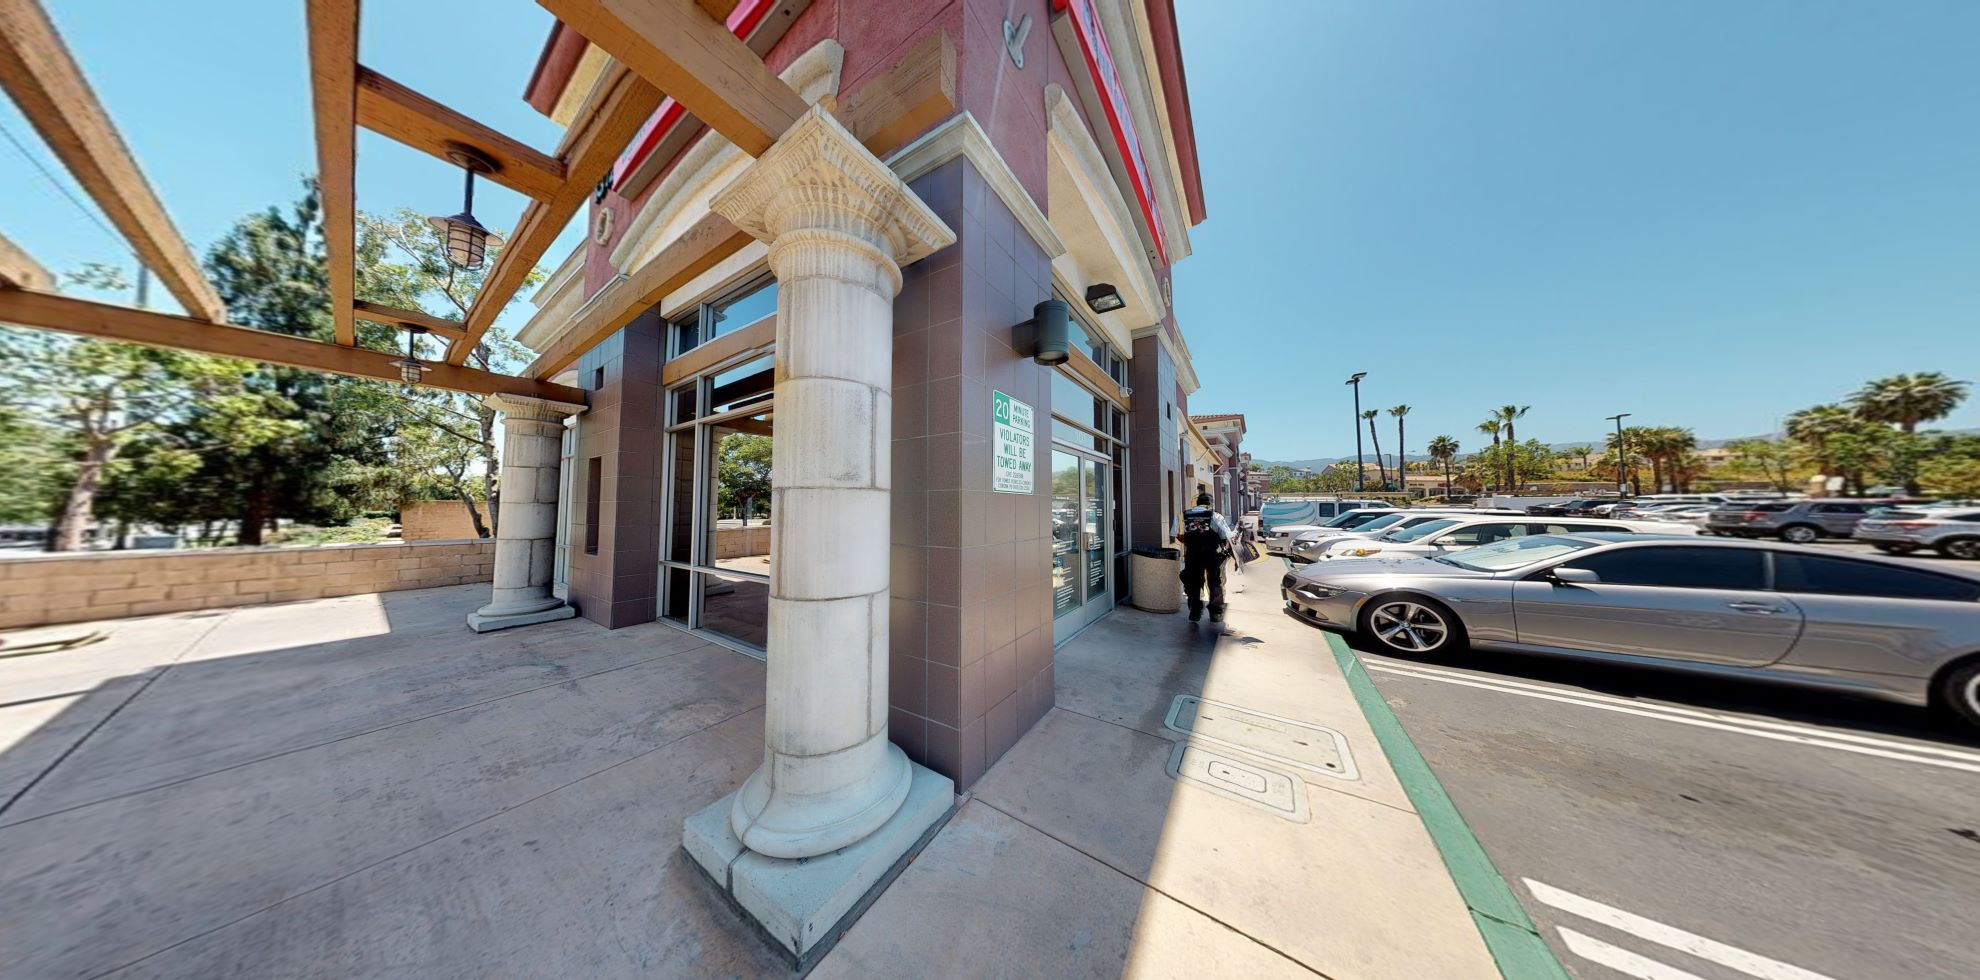 Bank of America financial center with walk-up ATM | 1312 E Ontario Ave STE 101, Corona, CA 92881